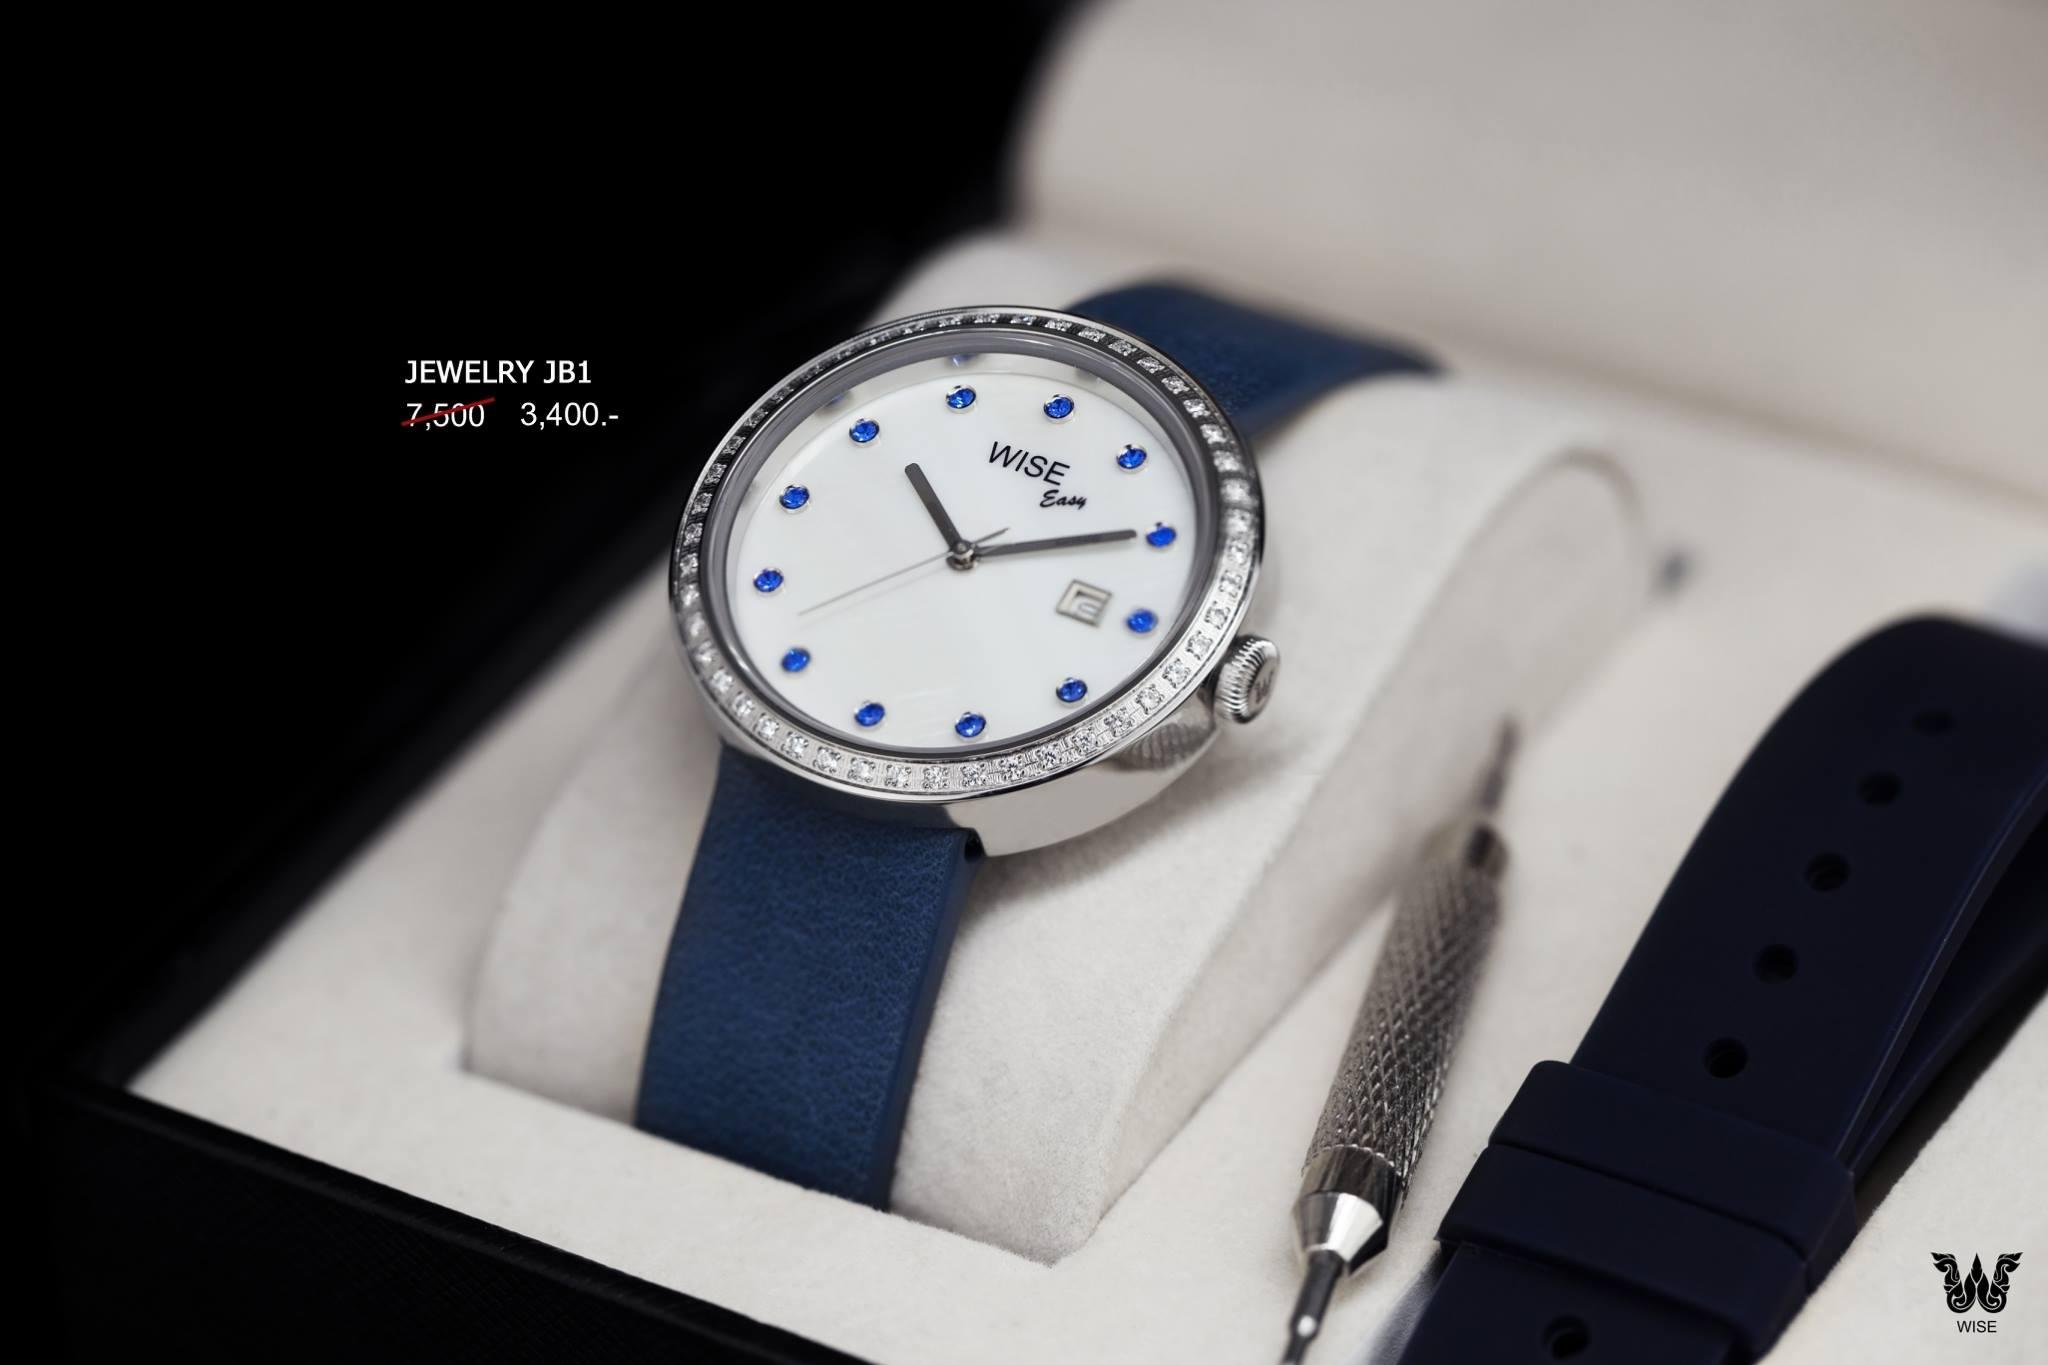 Jewelry JB1